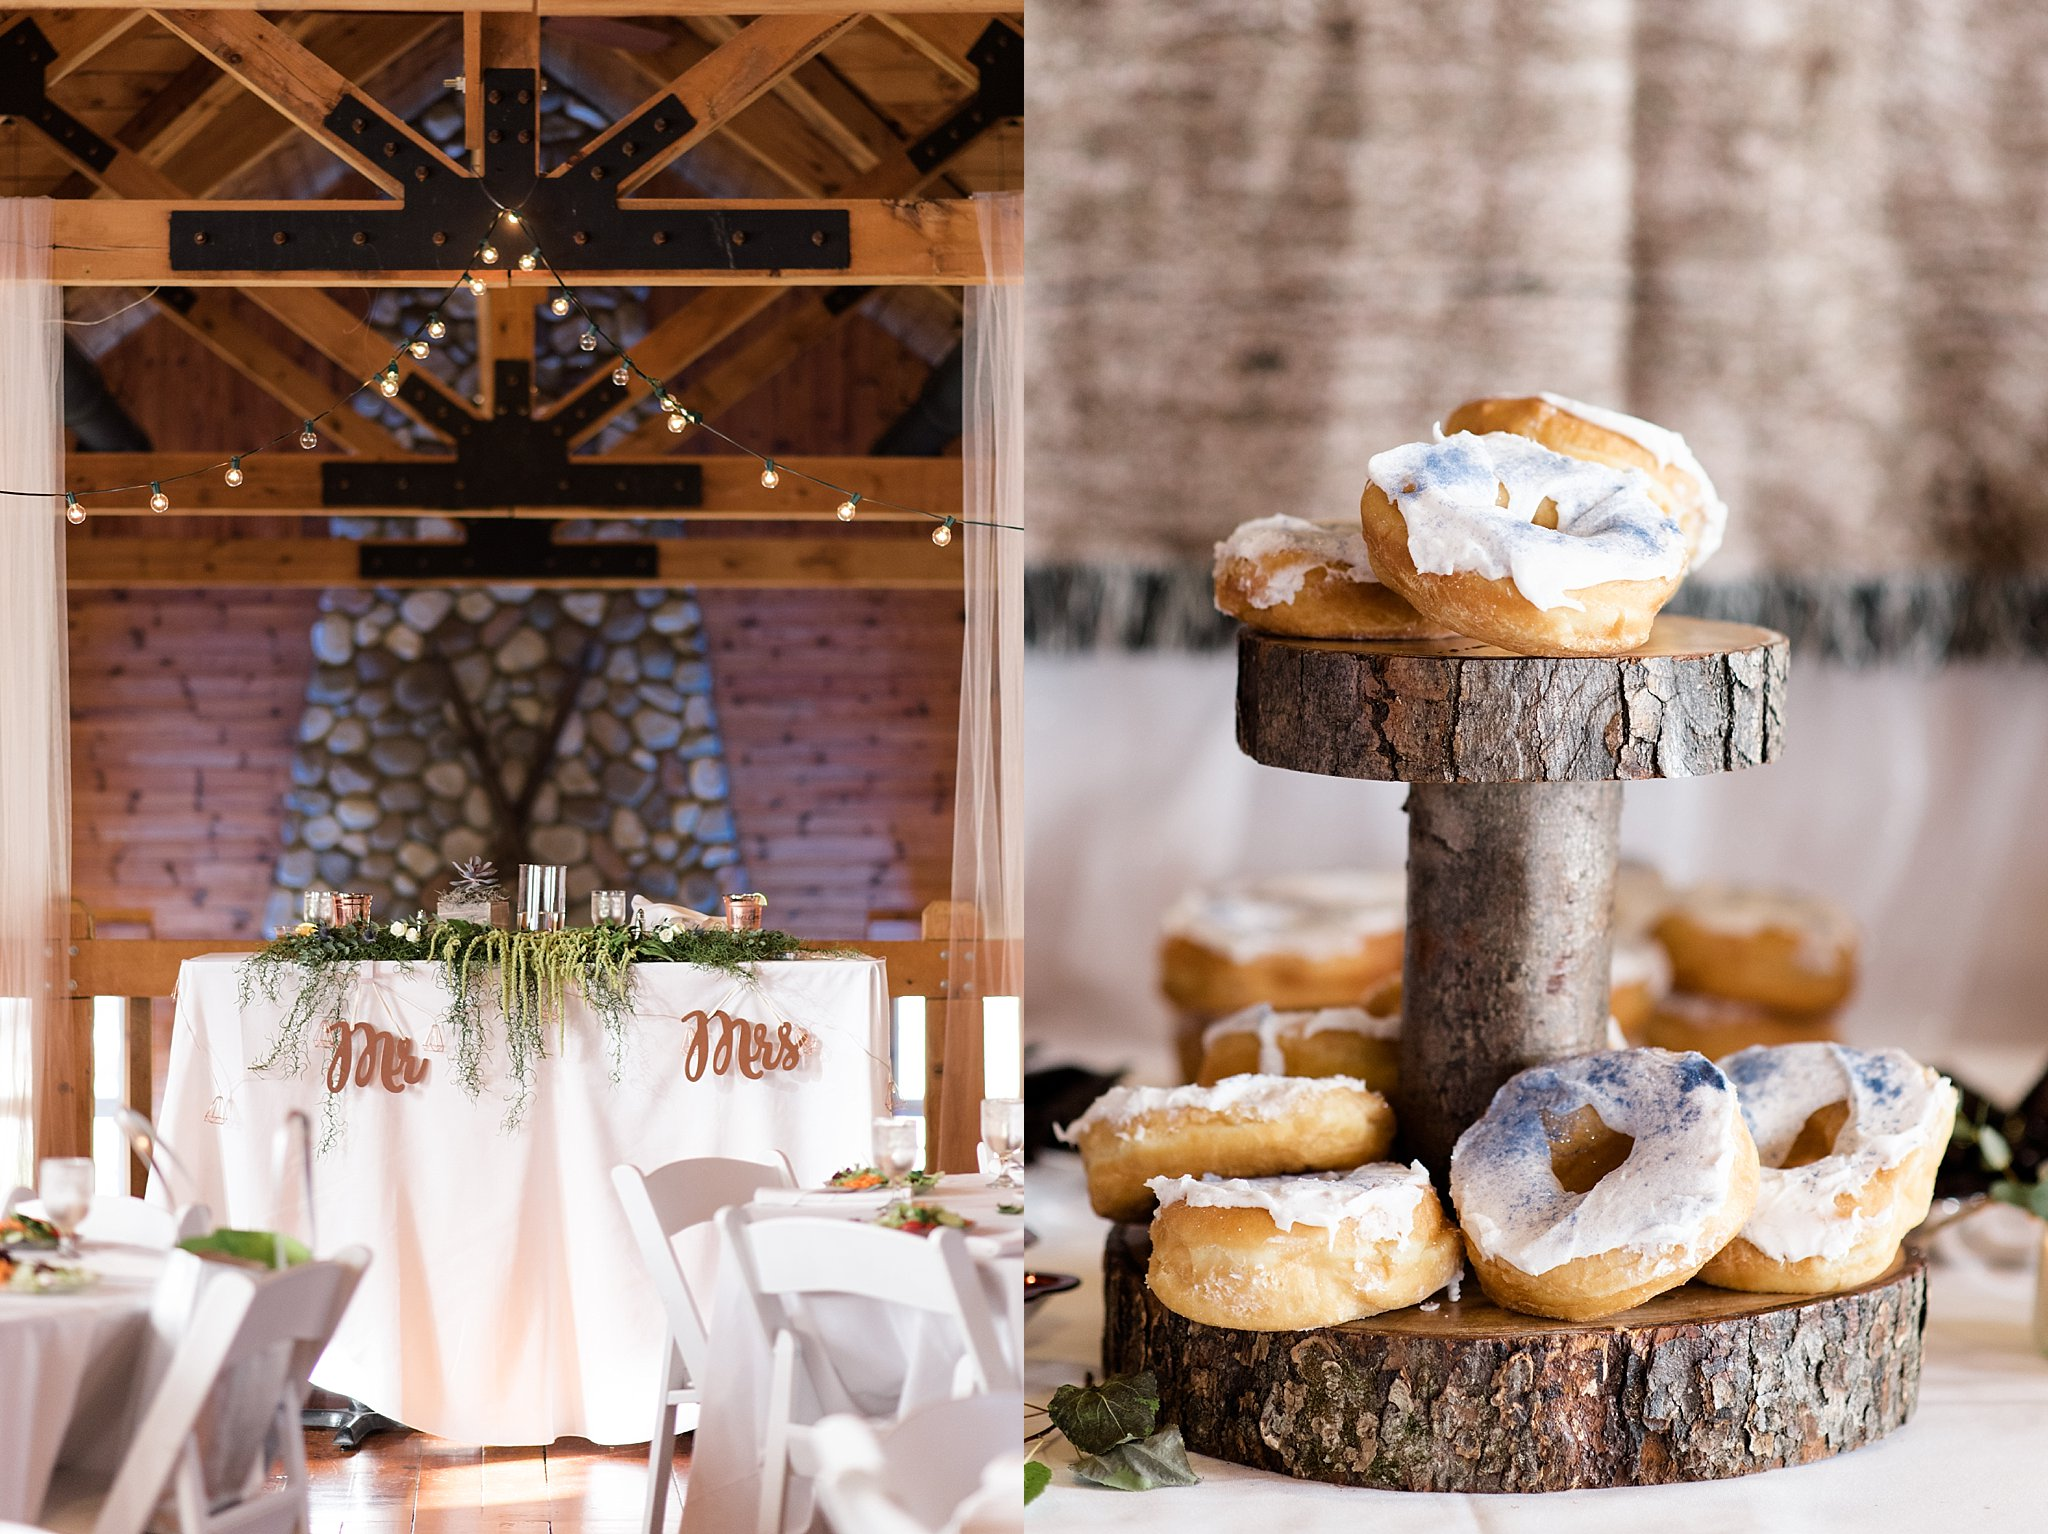 Cadillac-Michigan-wedding-caberfae-peaks-milwaukee-photographer_0067.jpg